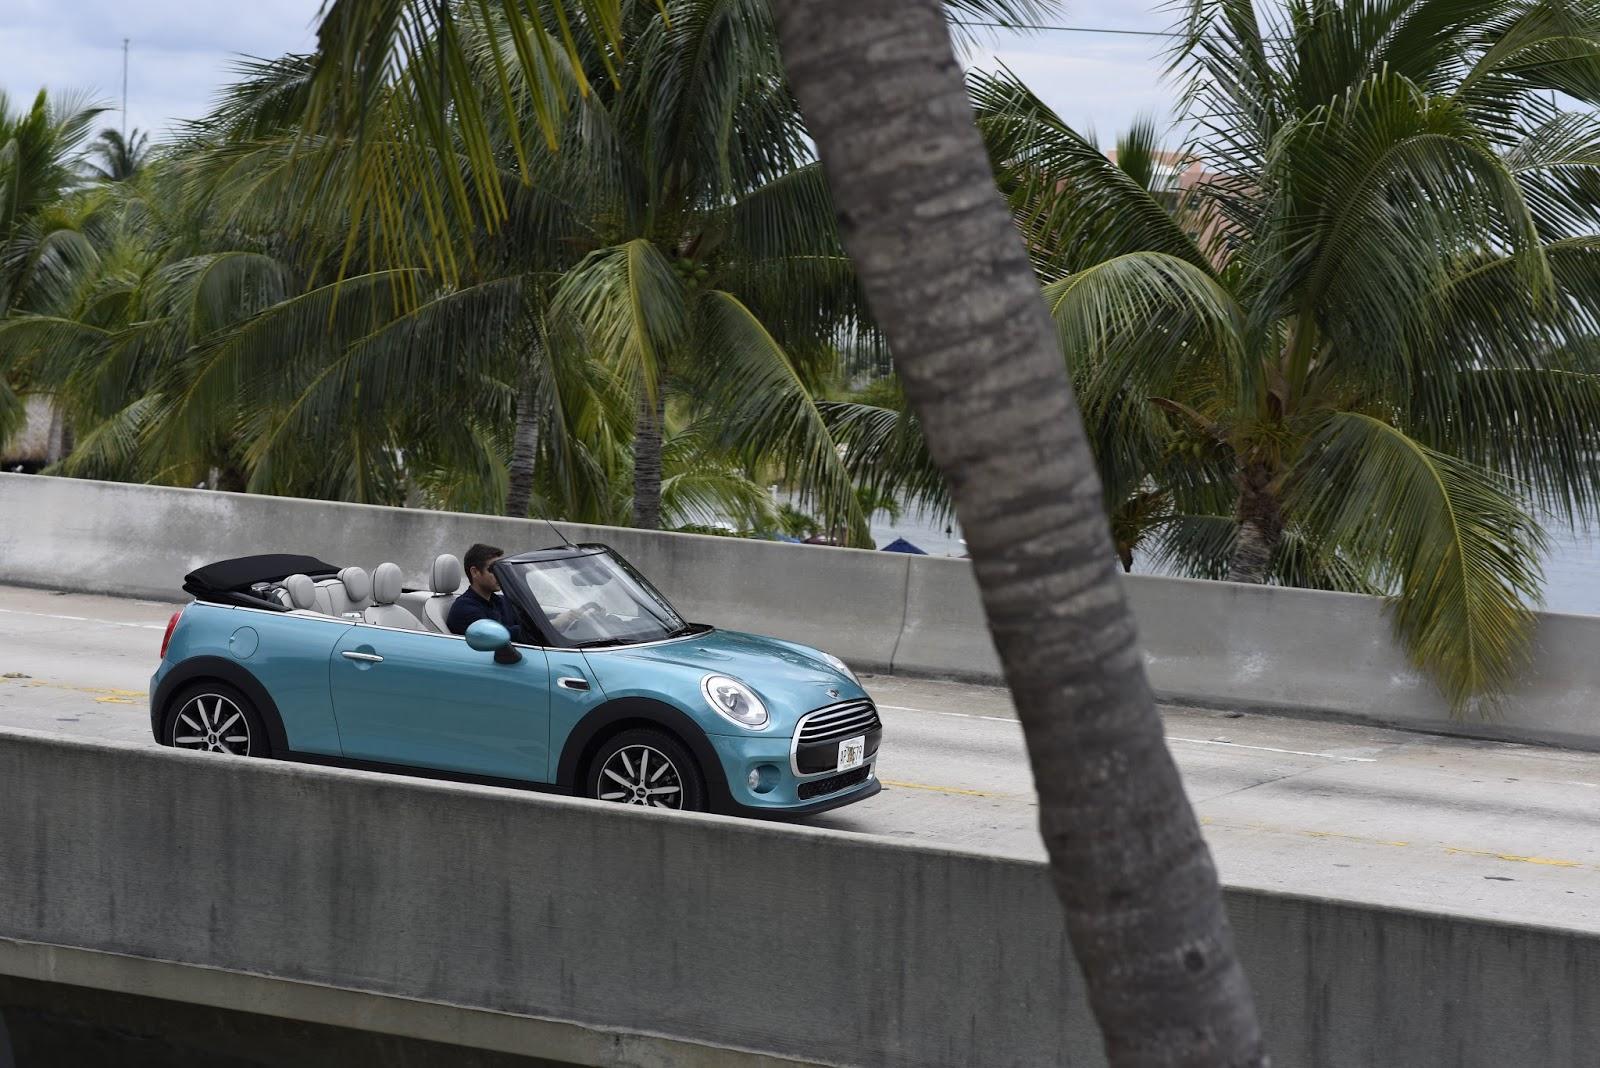 P90209644 highRes the new mini convert Με μία ταινία μικρού μήκους διαφημίζεται το νέο MINI Cabrio Advertorial, videos, Μινι, ΜΙΝΙ Cabrio